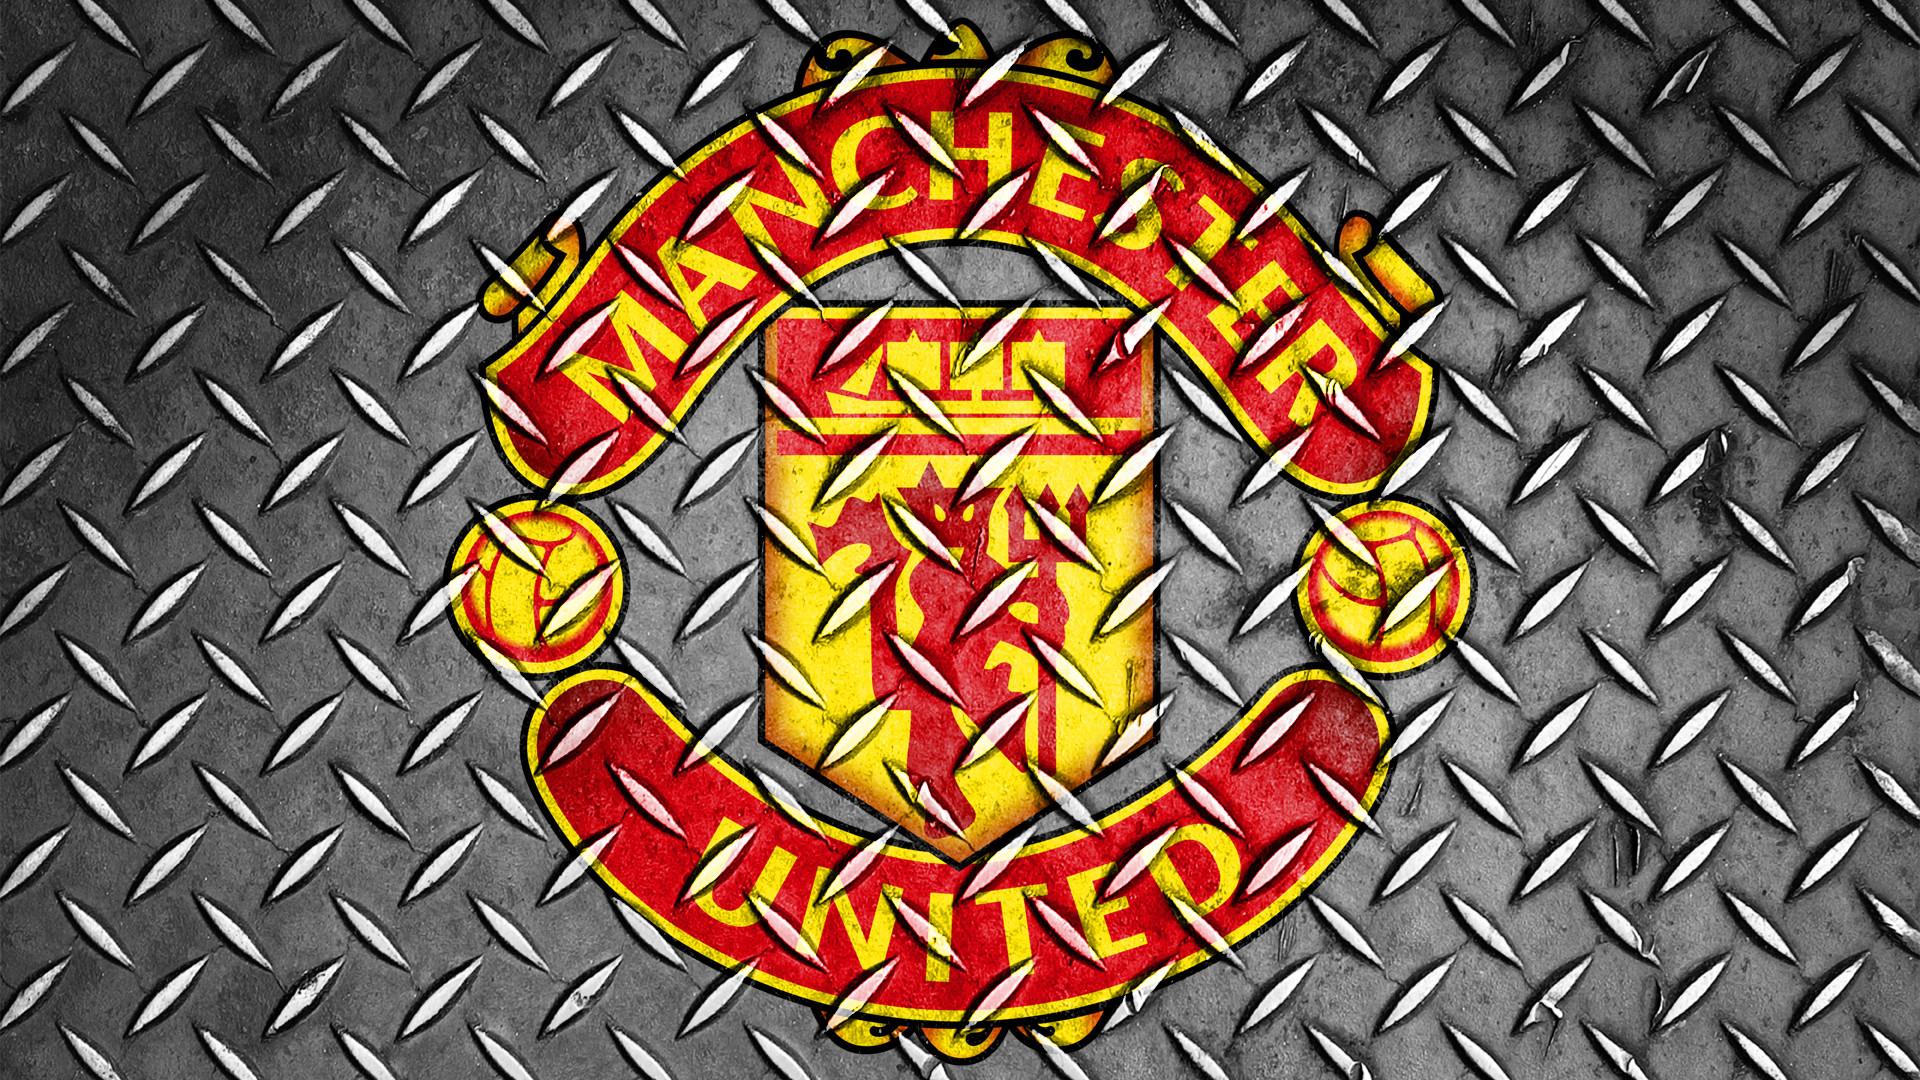 Logo-man-united-hd-wallpapers ·  manchester_united_football_team_wallpaper_desktop_hd1